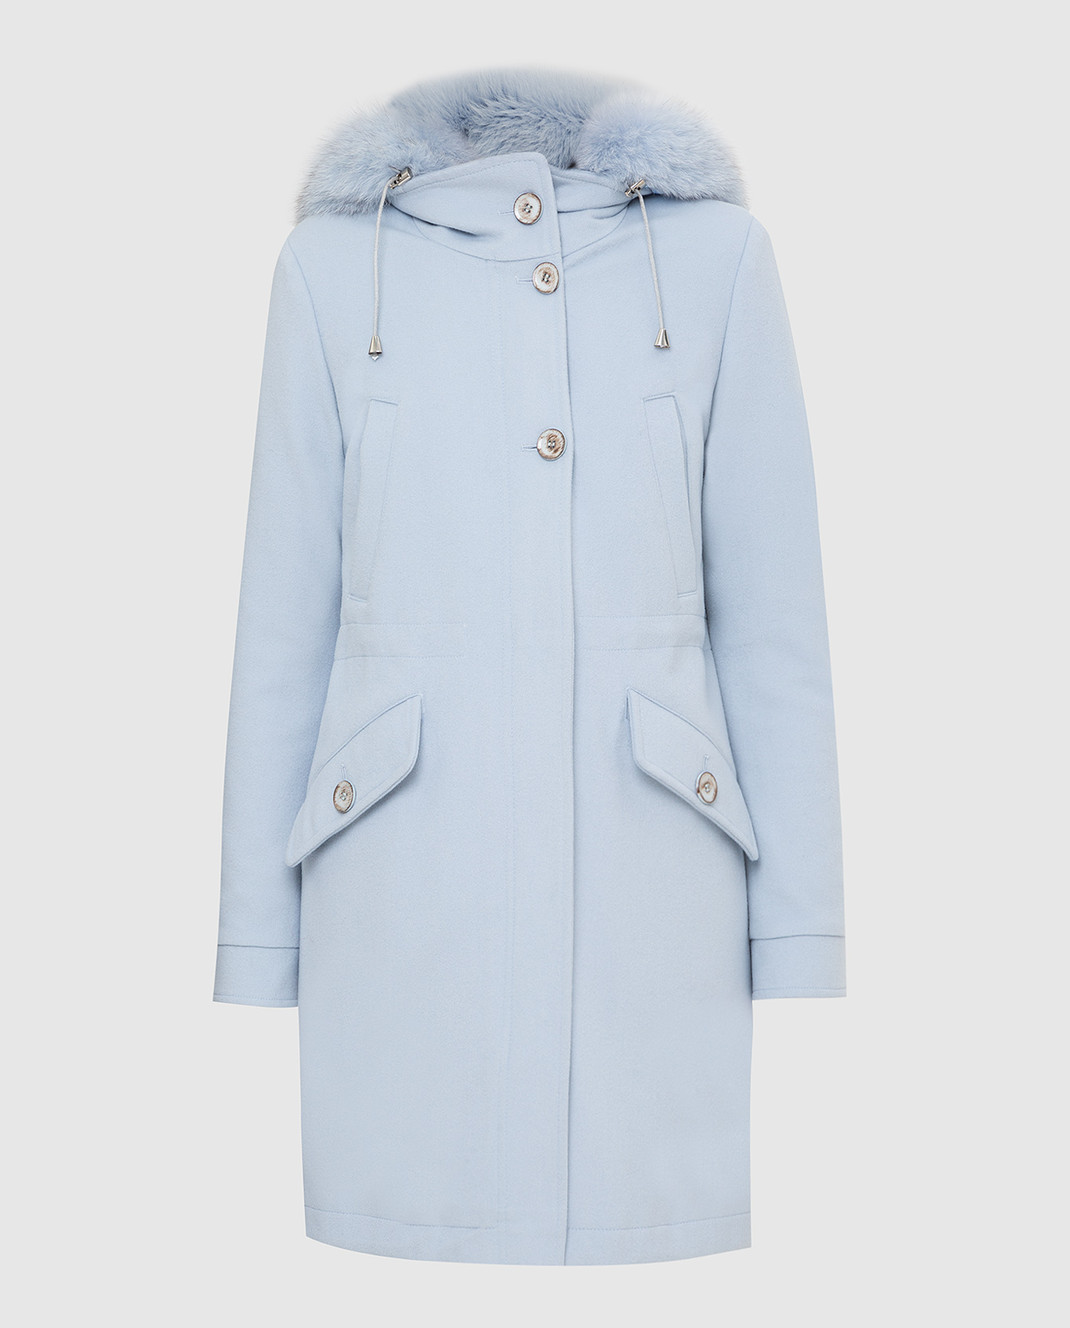 Heresis Голубое пальто из шерсти P1290VO